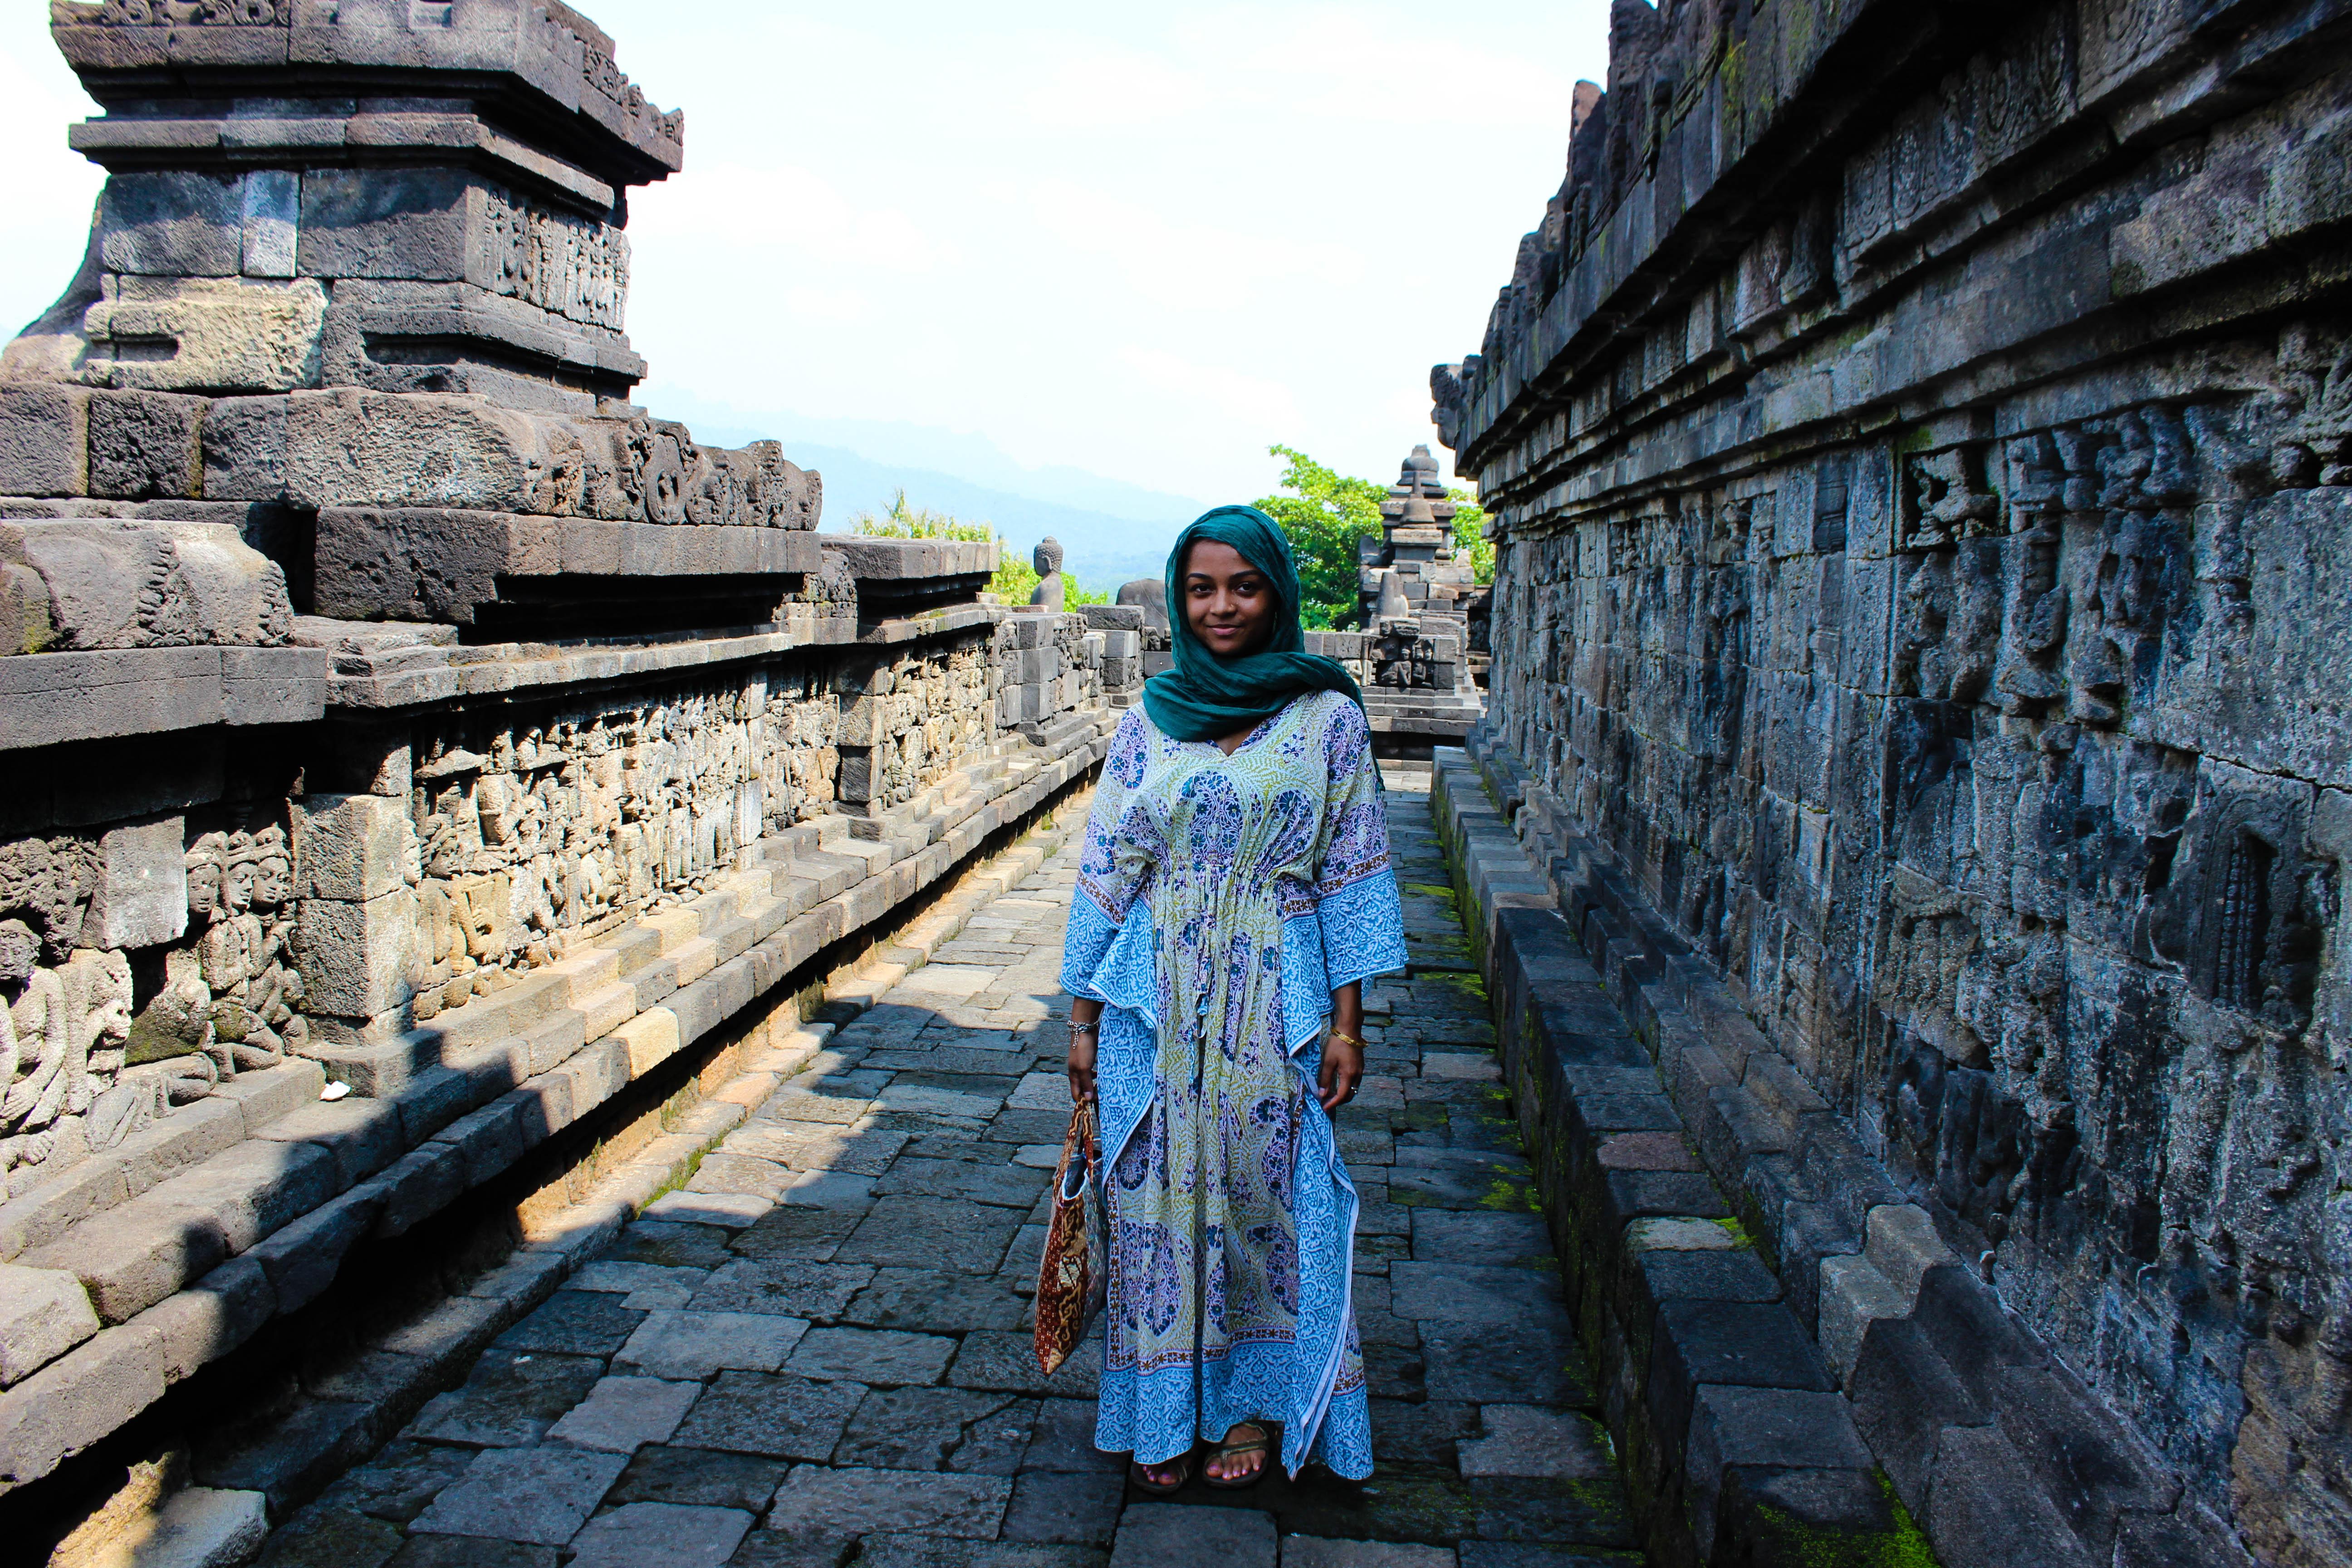 MichellePeng_BorobudurTemple2_JavaIndonesia